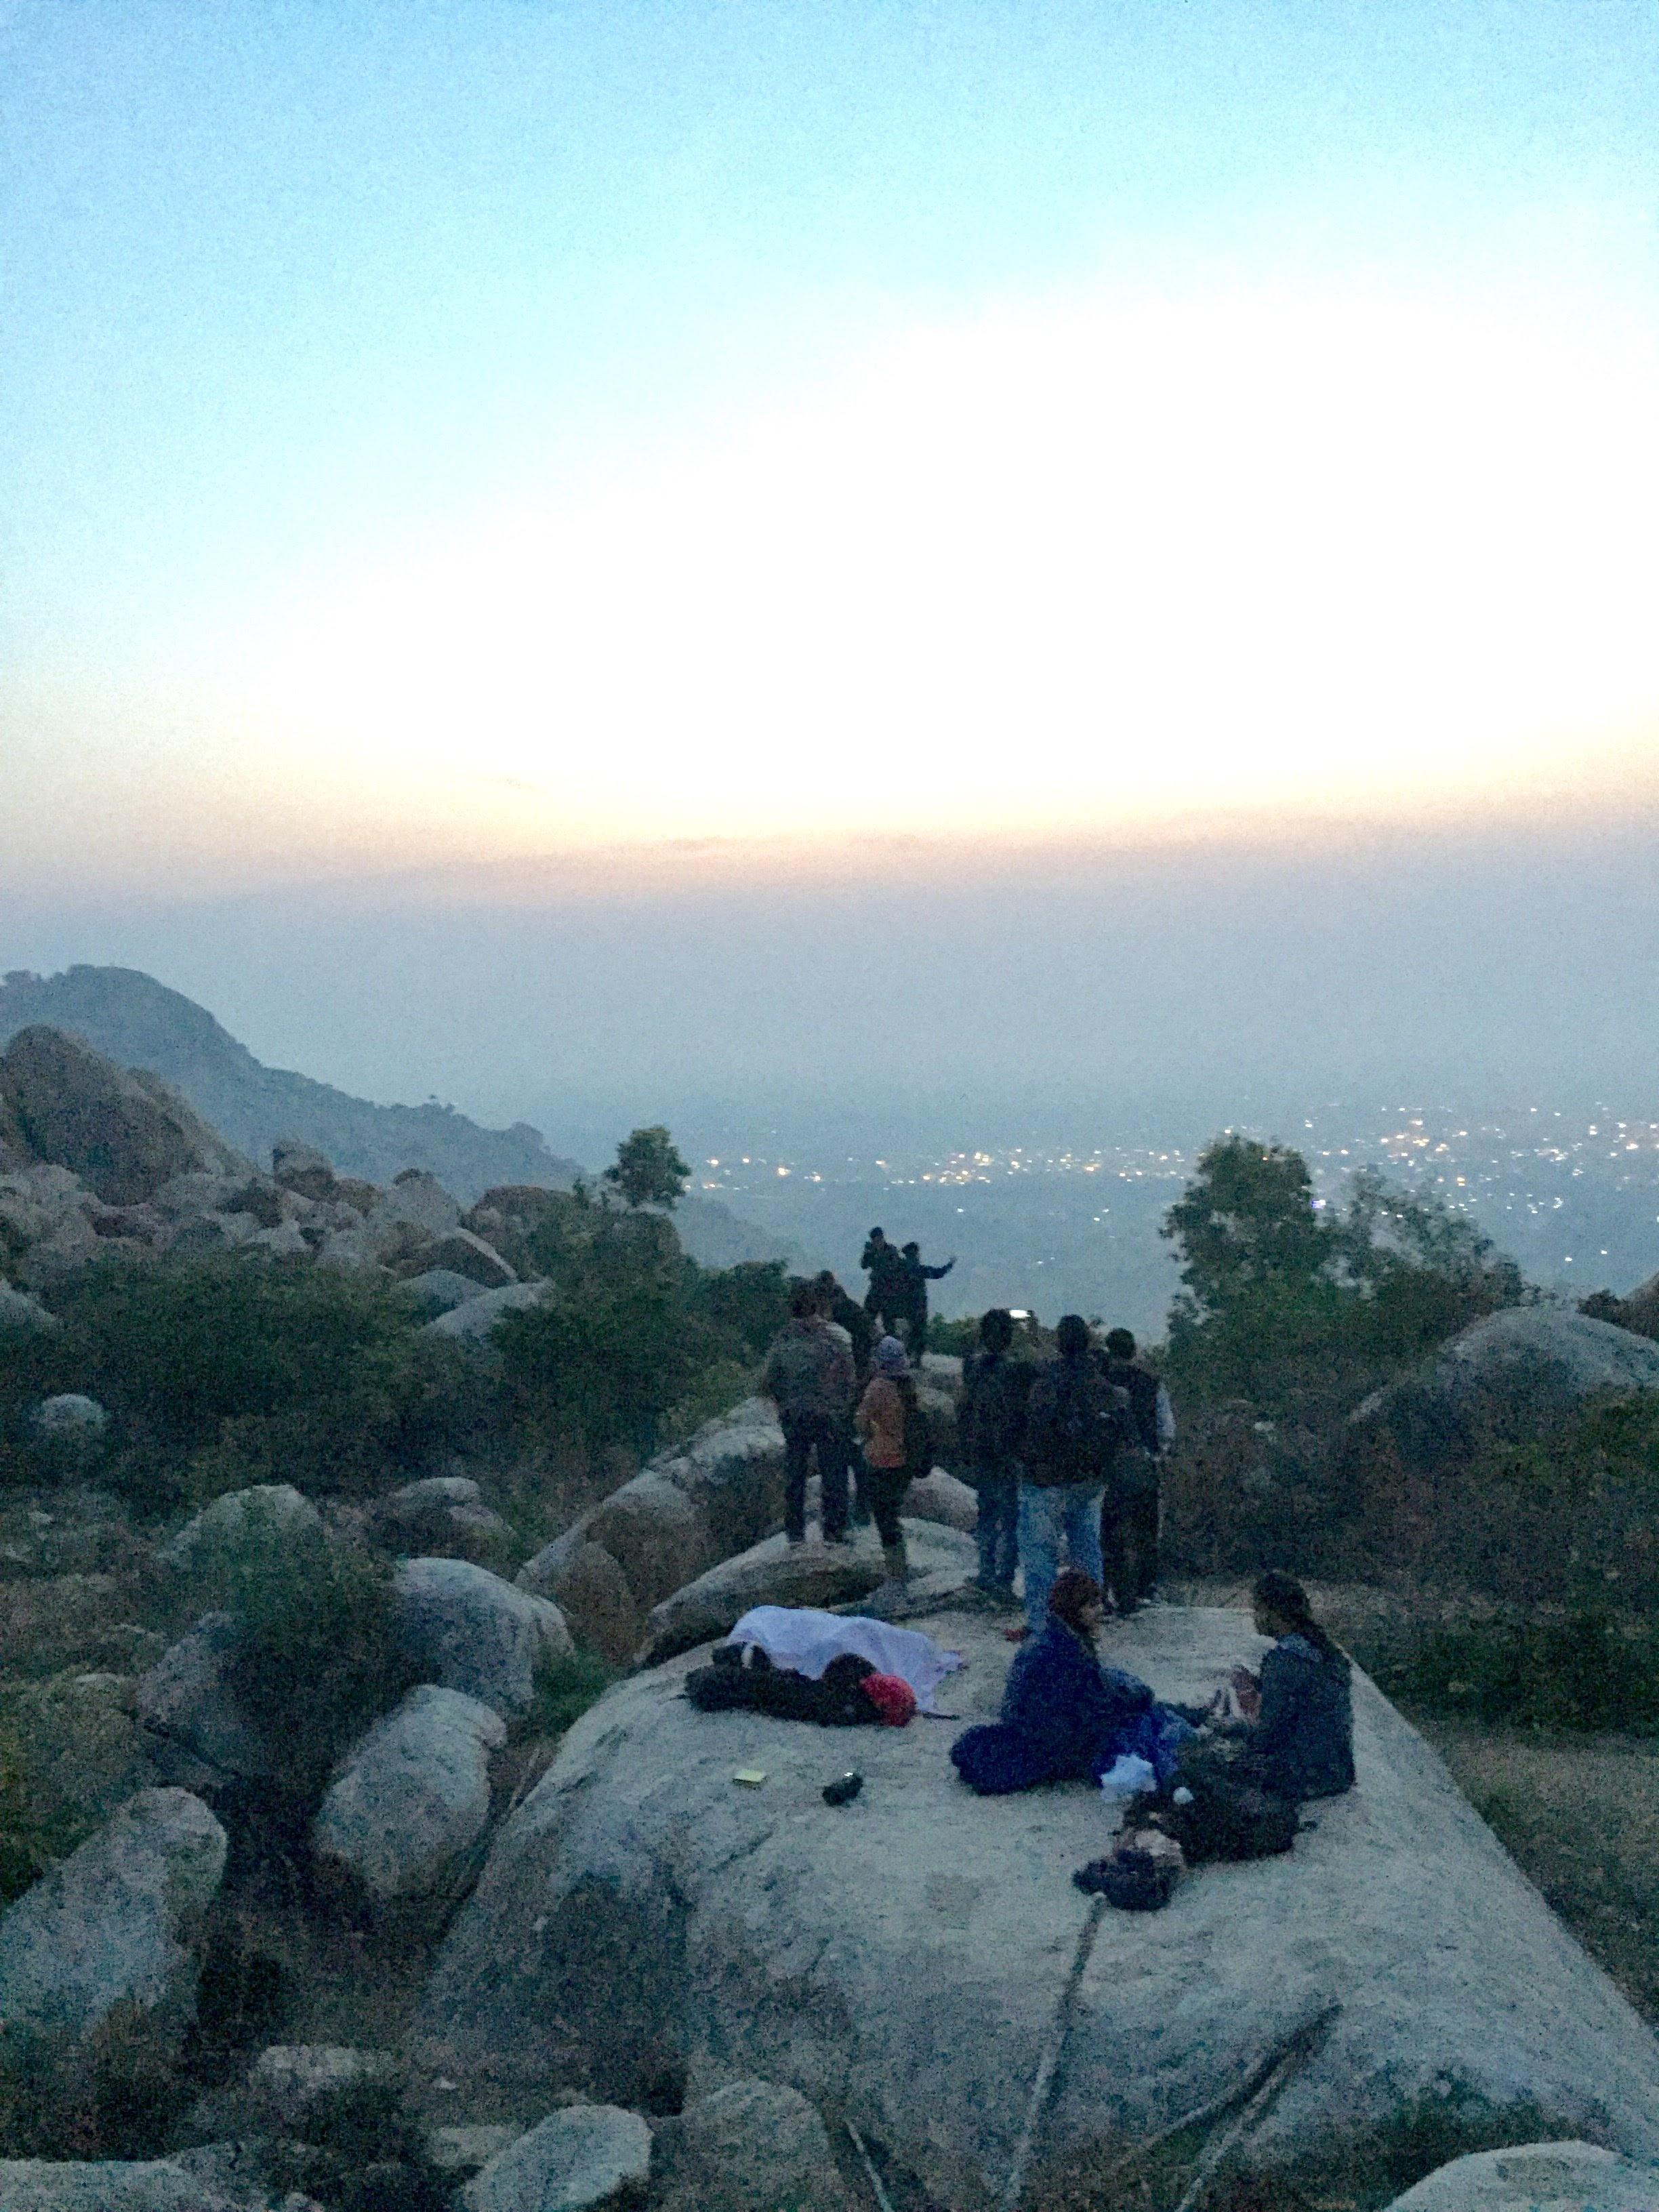 Sunrise view - Anthargange hills